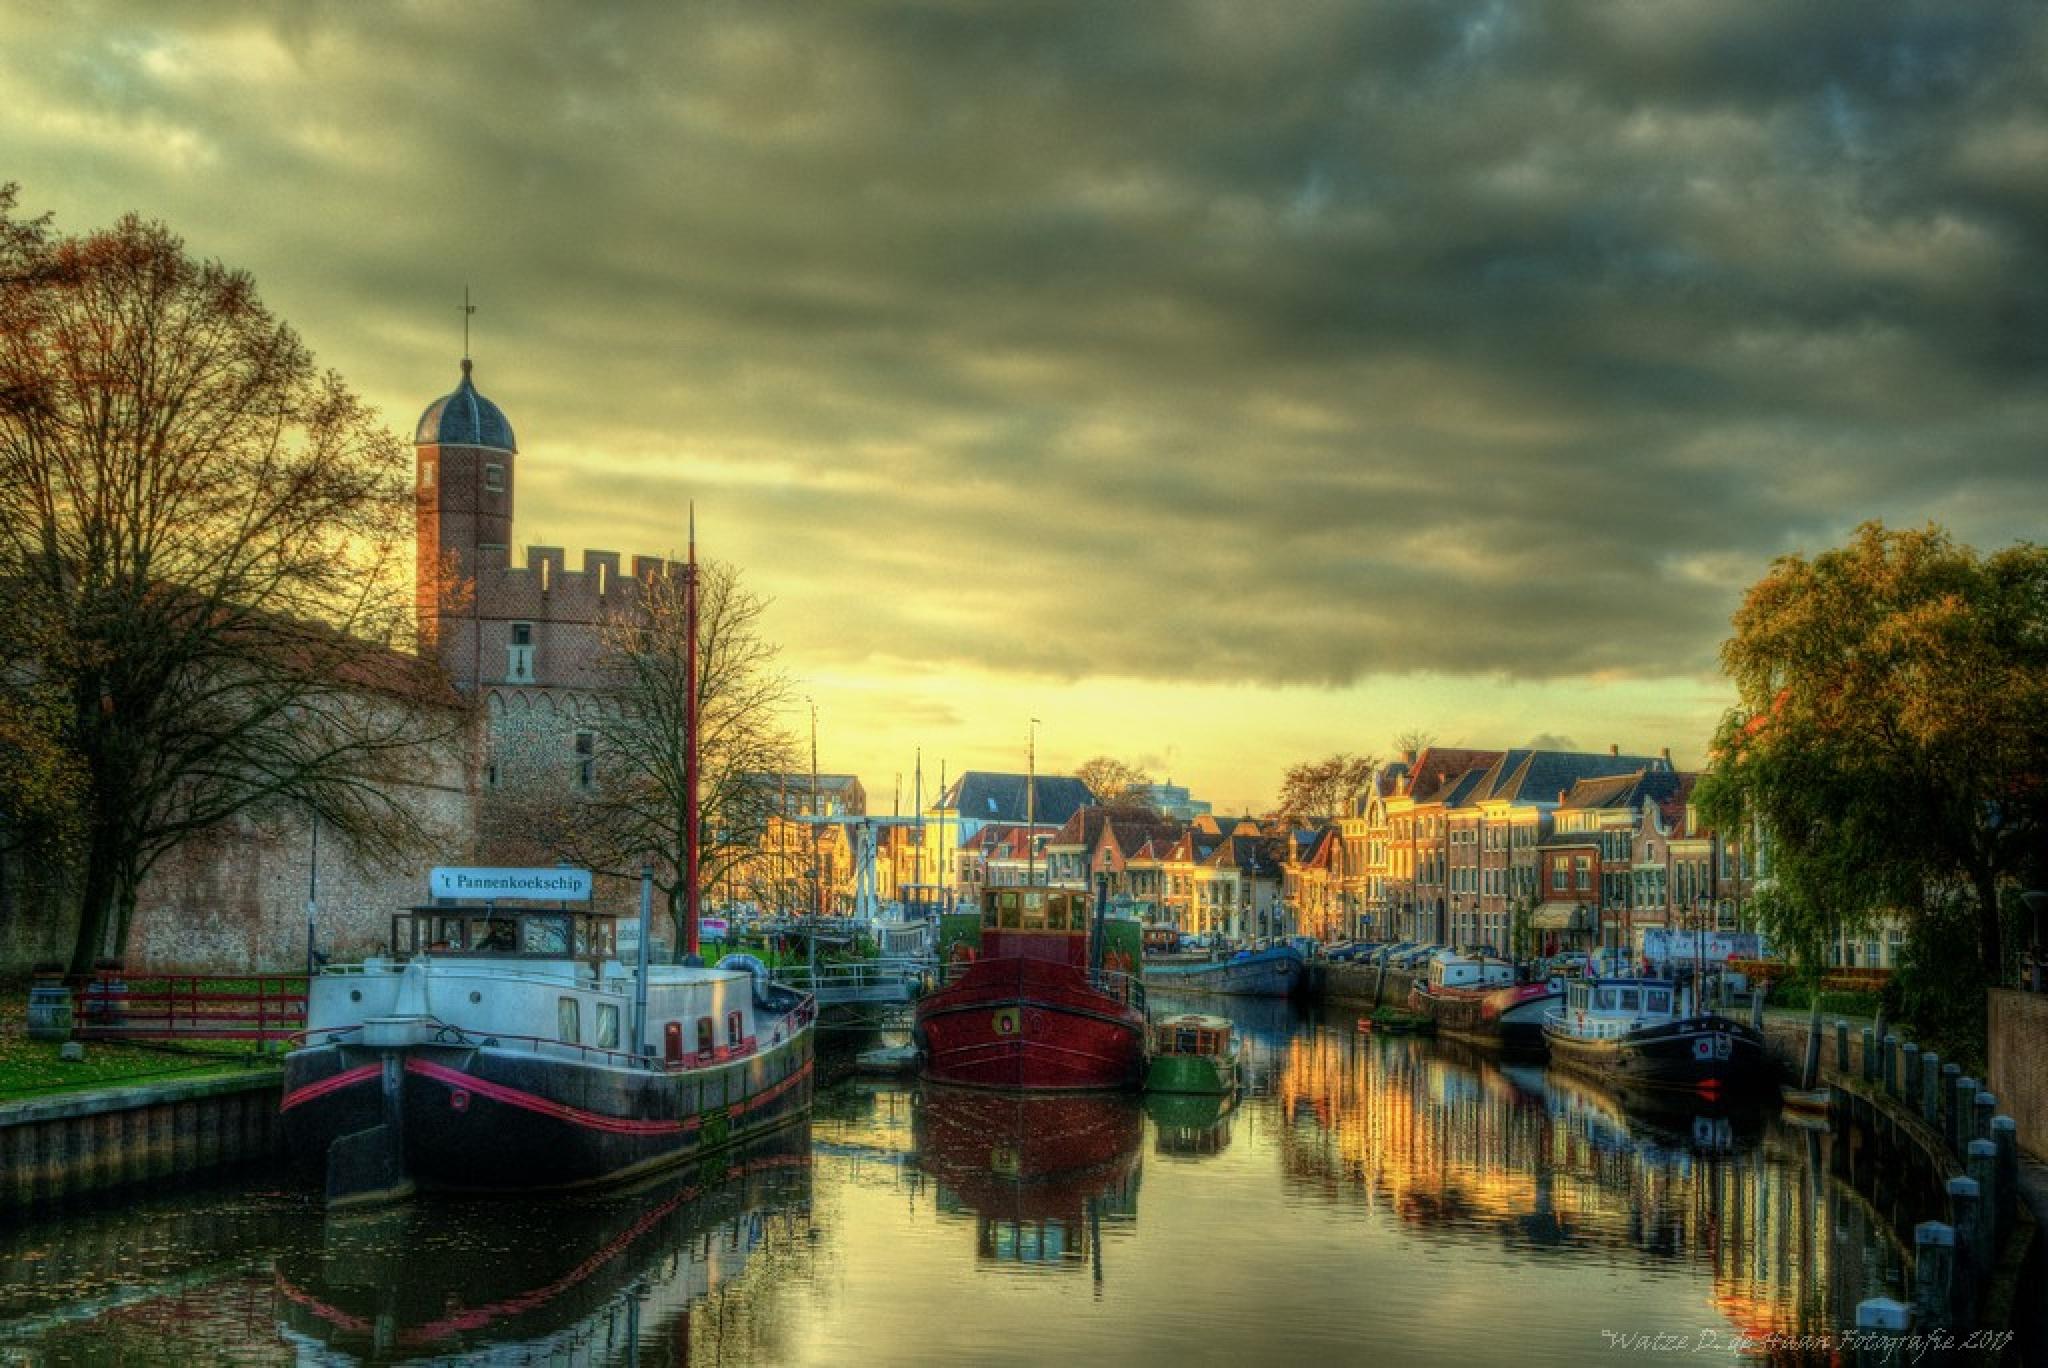 Before sunset Zwolle Netherlands II by Watze D. de Haan